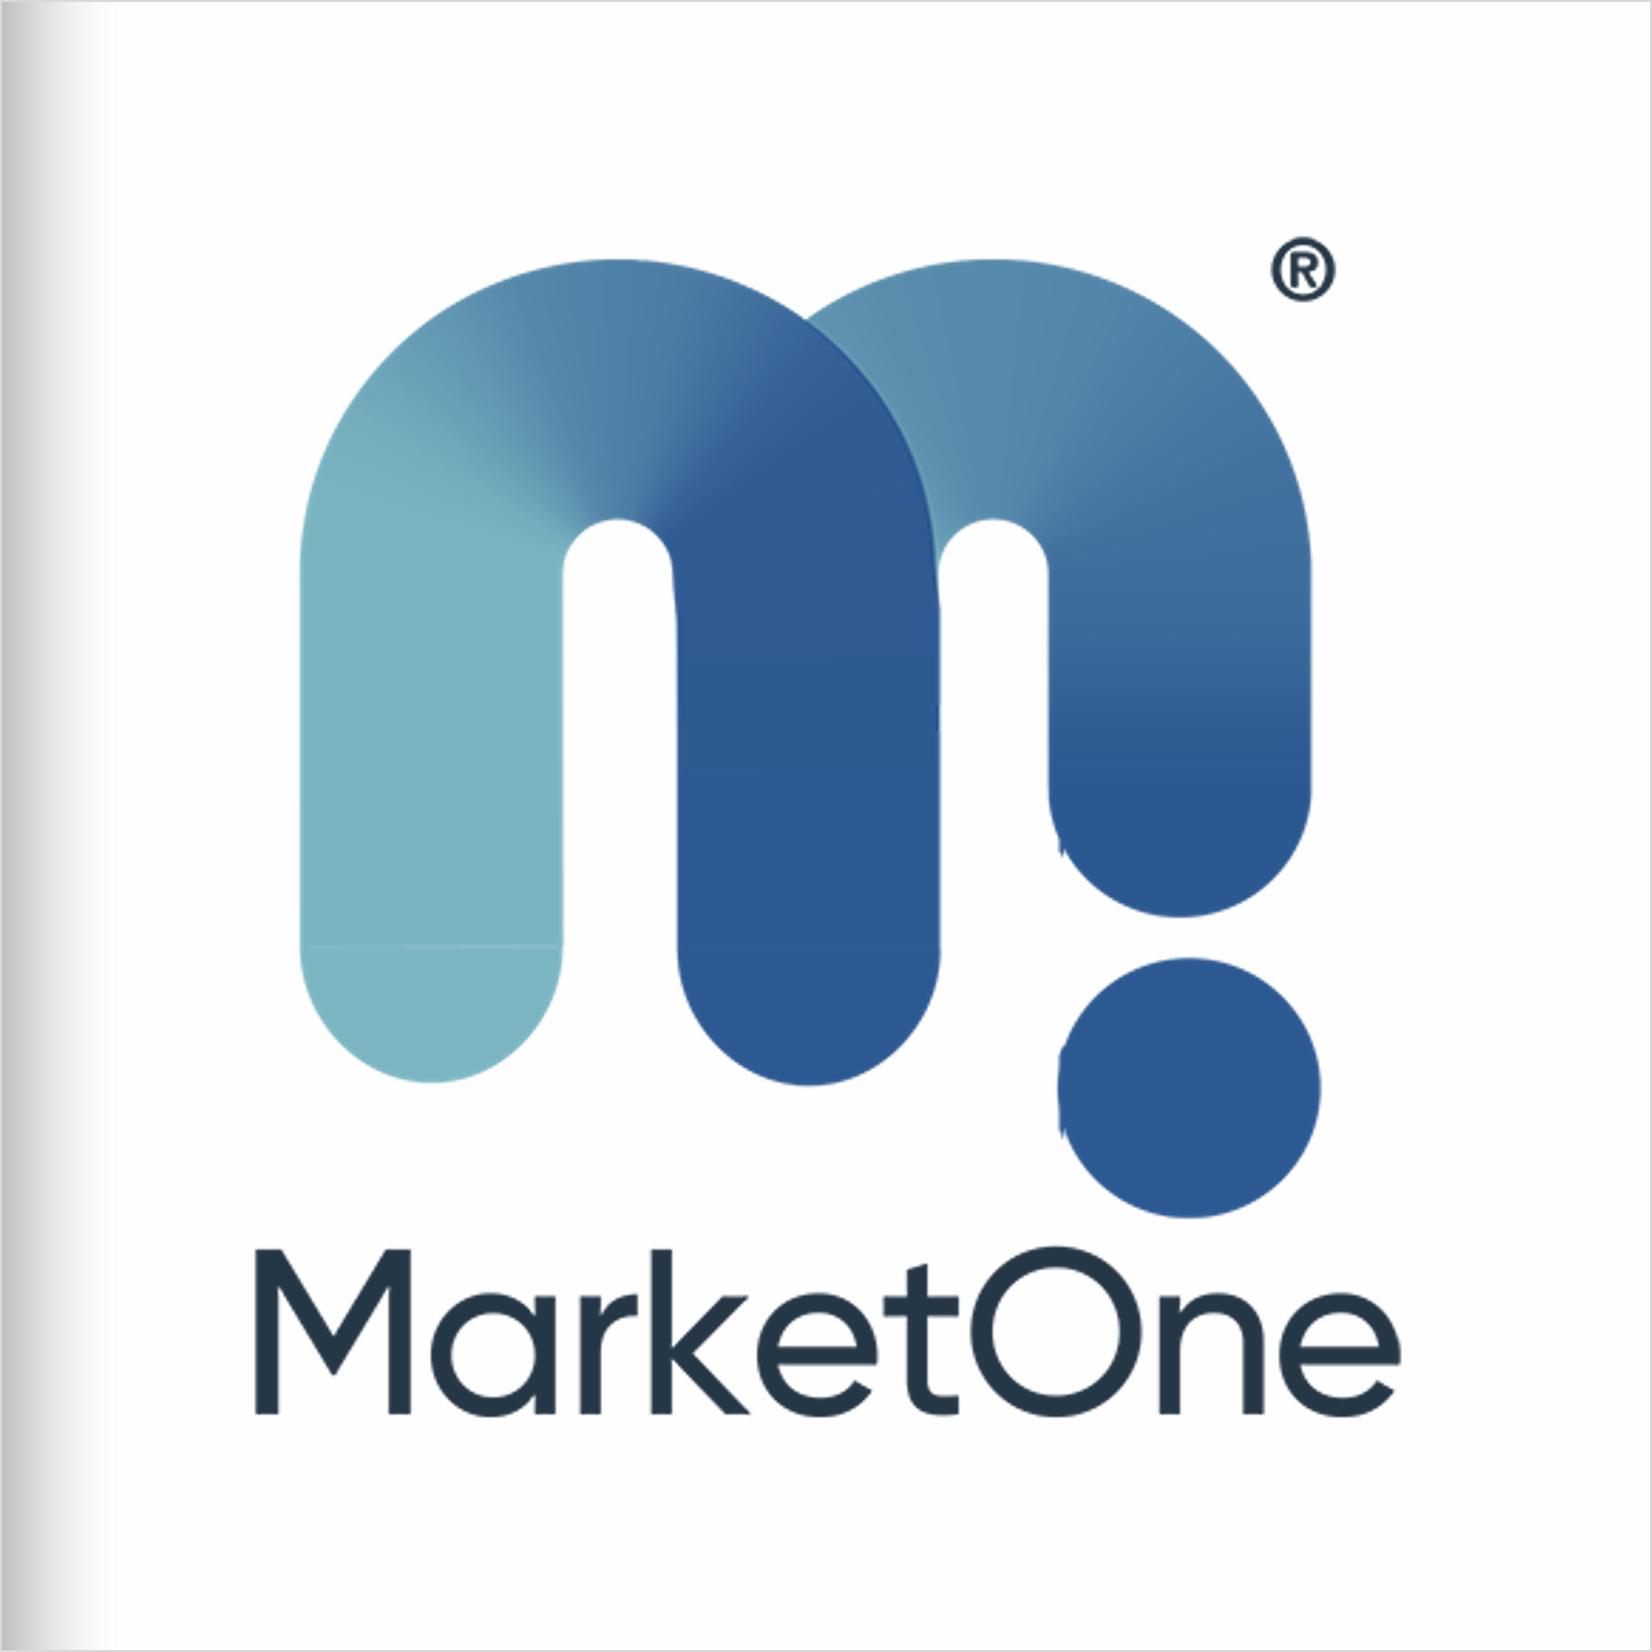 MarketOne® ご紹介資料